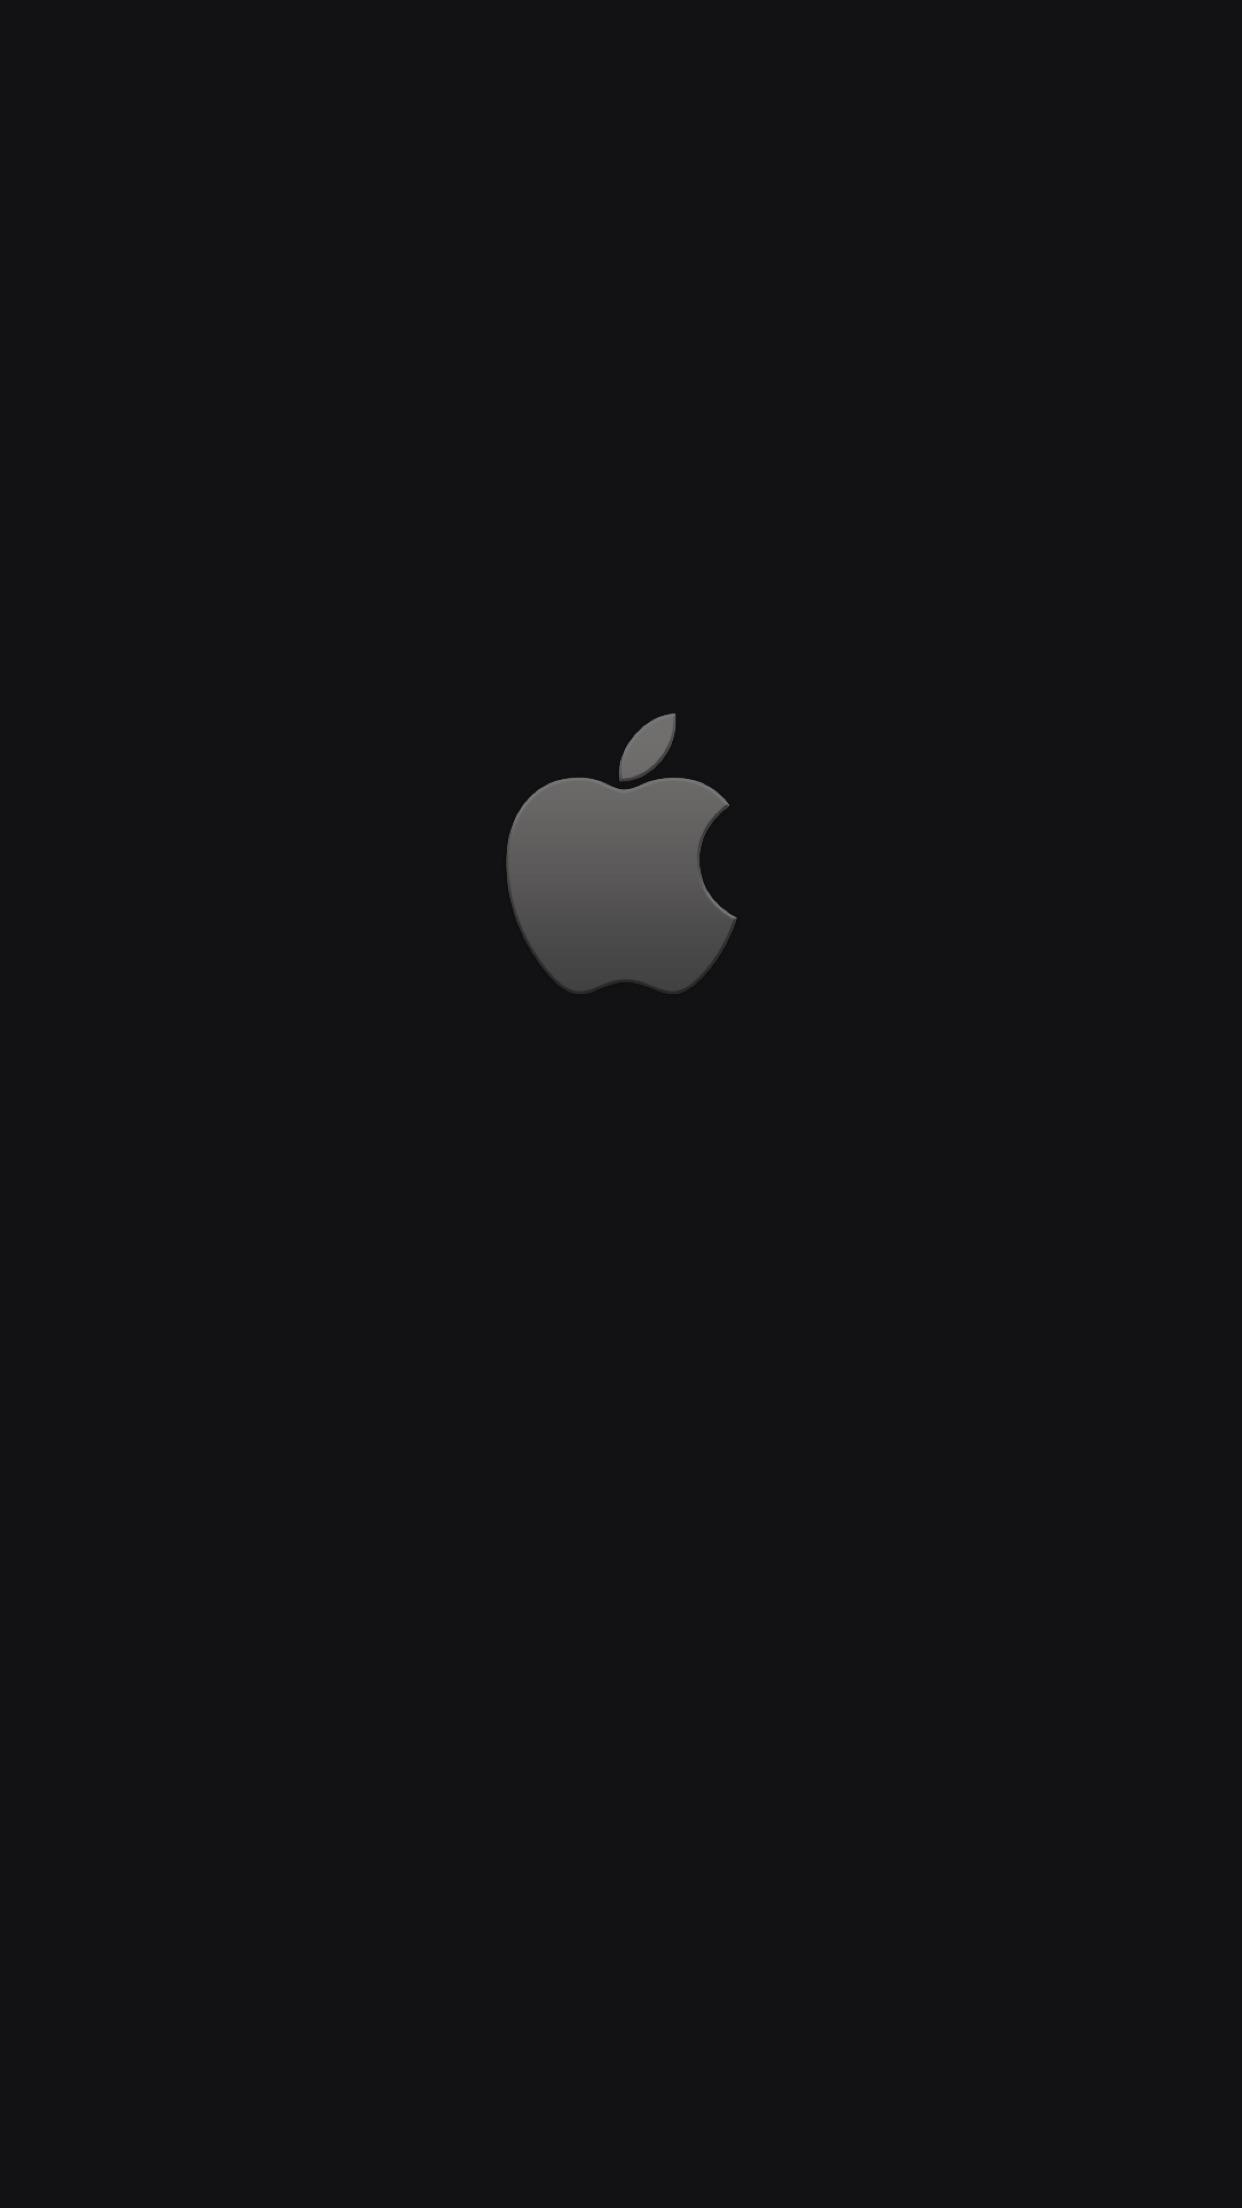 Apple Logo Enjoy Download At Http Www Myfavwallpaper Com 2018